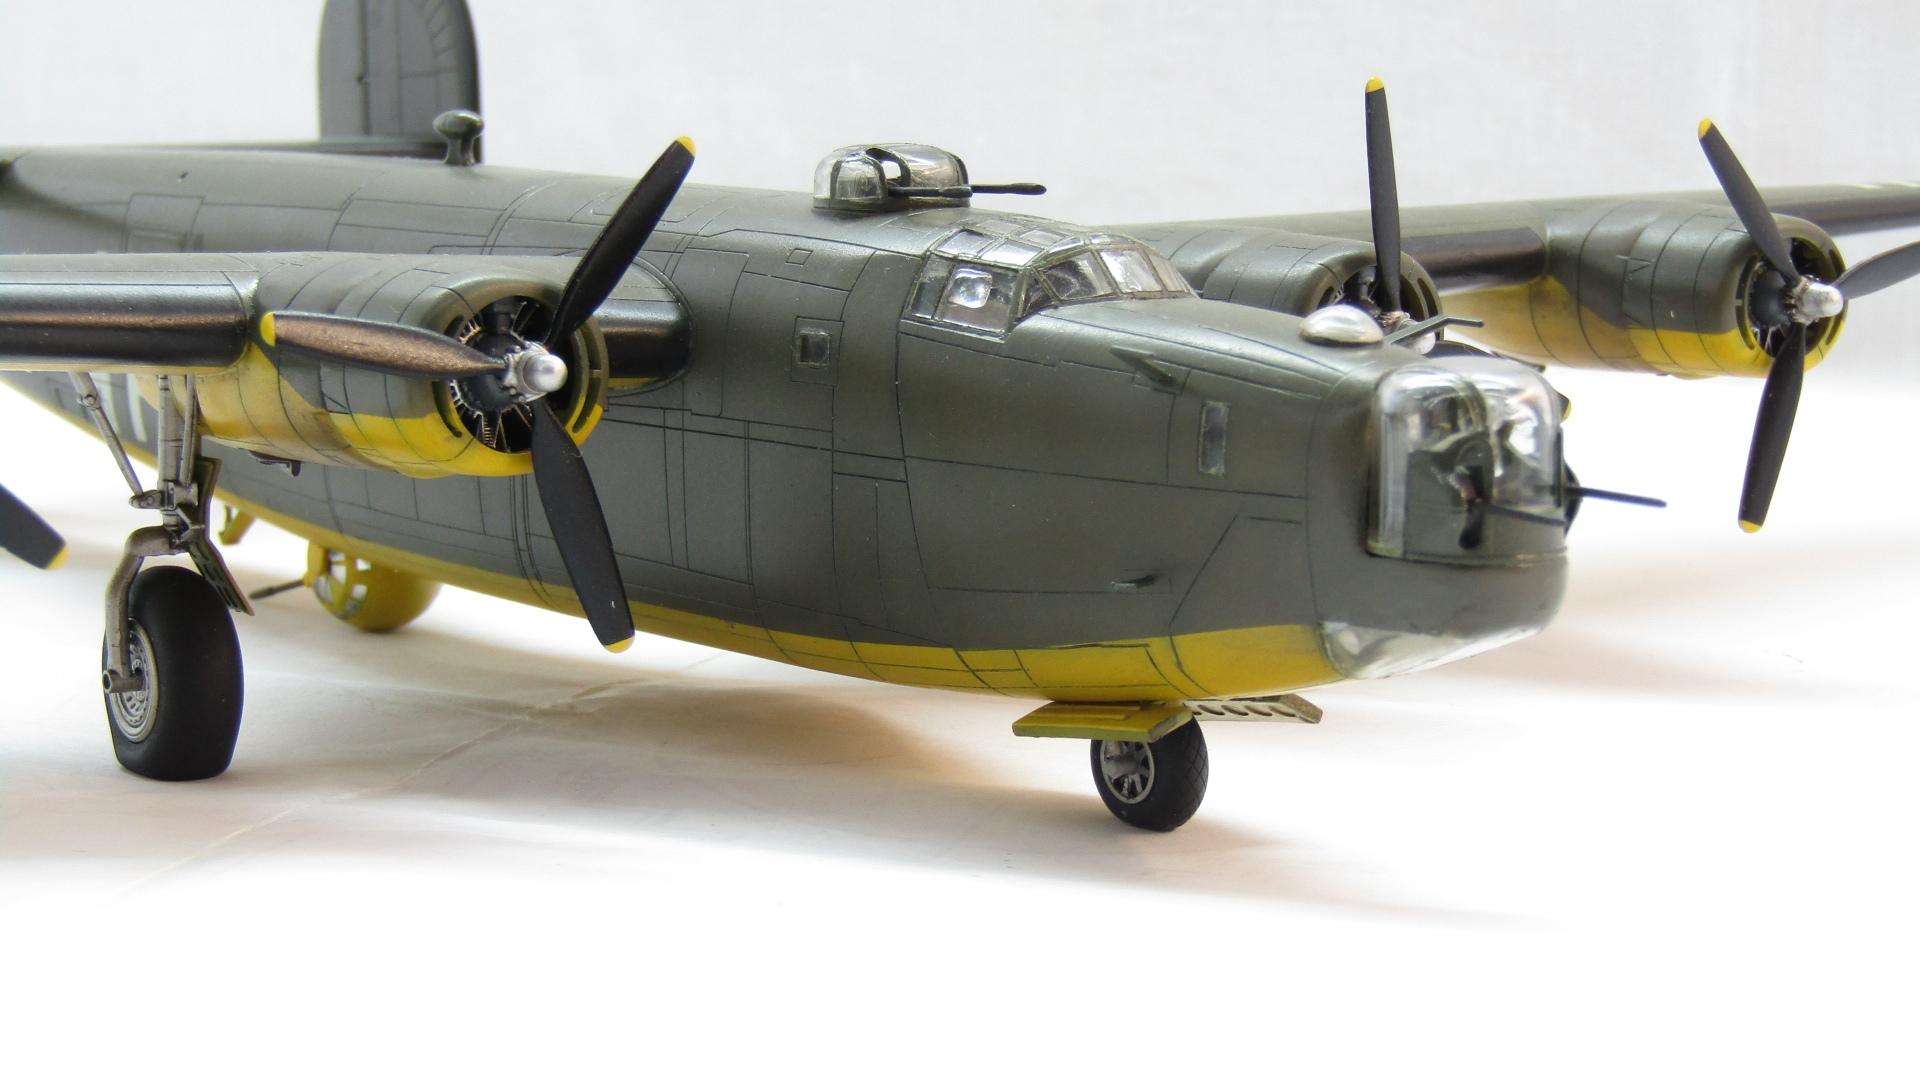 B-24H Liberator 1/72 (Academy) 3cLM4RN1AEU